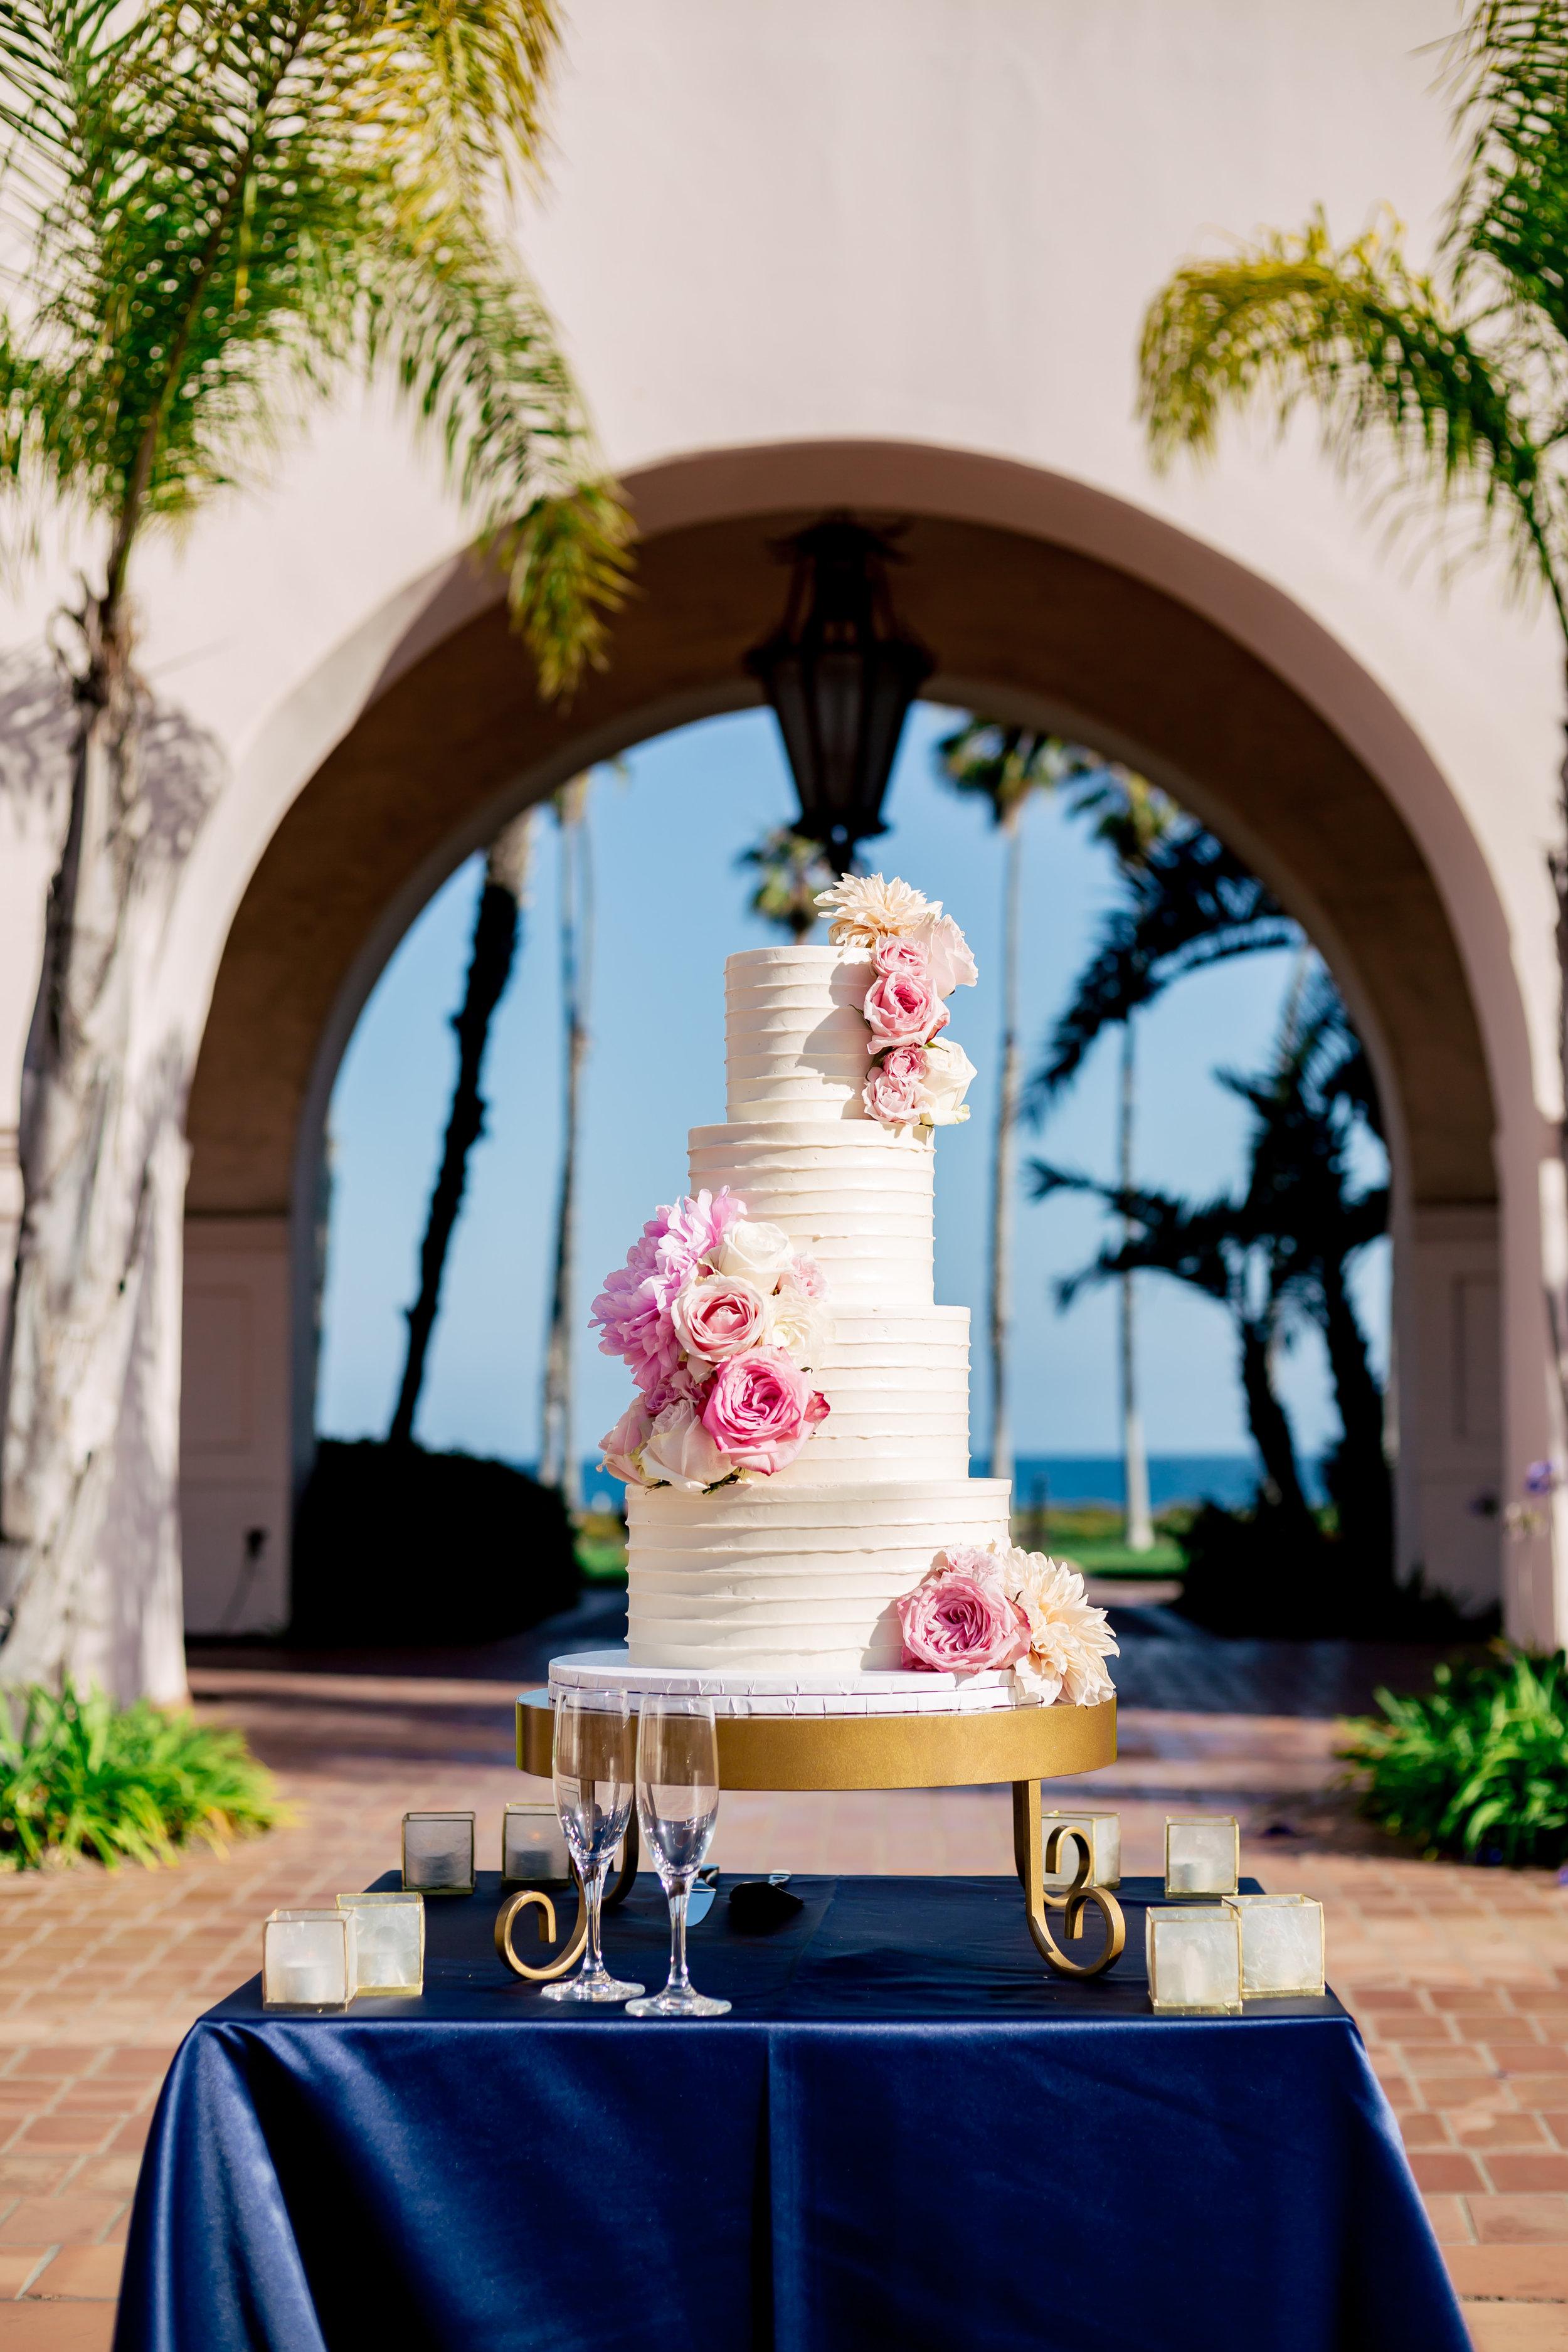 www.santabarbarawedding.com   Rewind Photography   Hilton Santa Barbara Beachfront Resort   Events by M and M   Wedding Cake